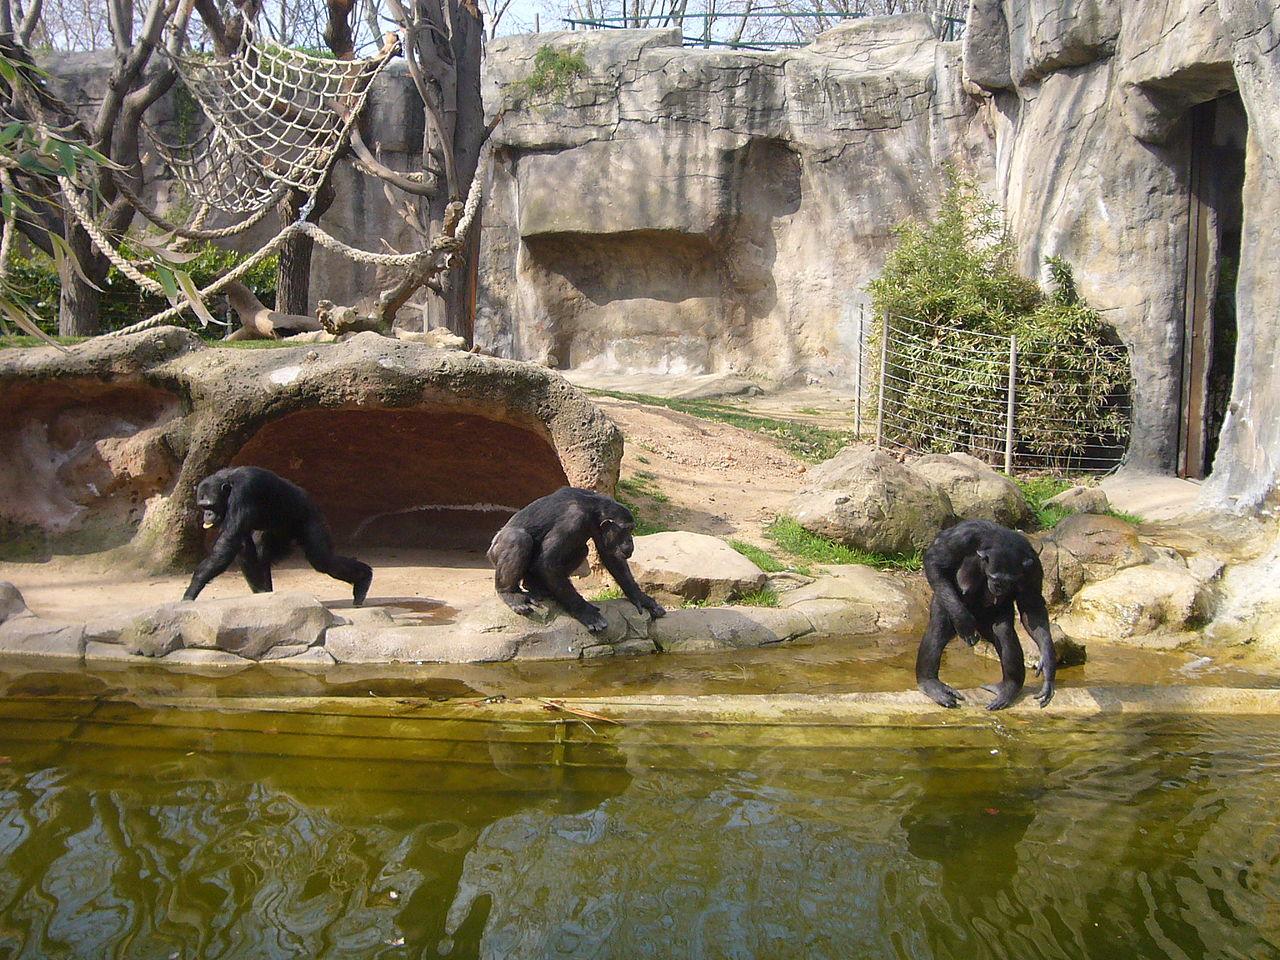 Zoo Barcelona barcelona zoo 2 for 1 or discount vouchers